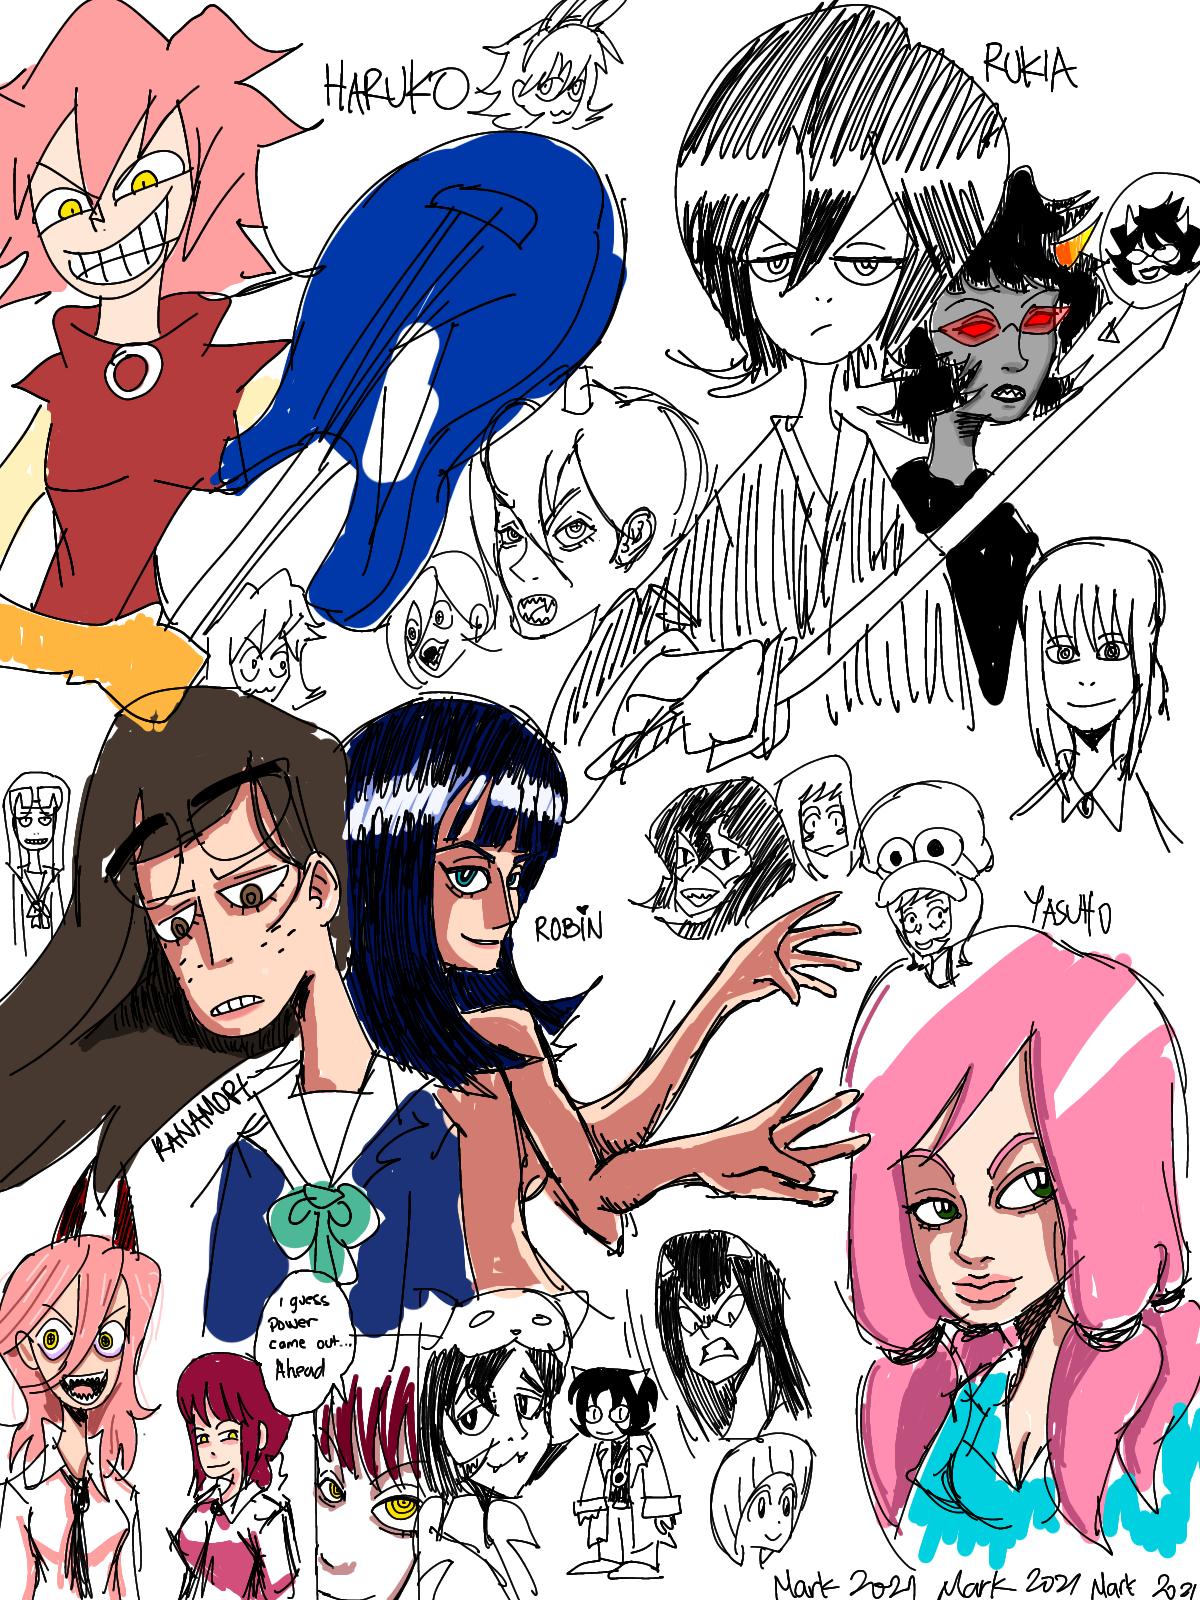 Babe doodles